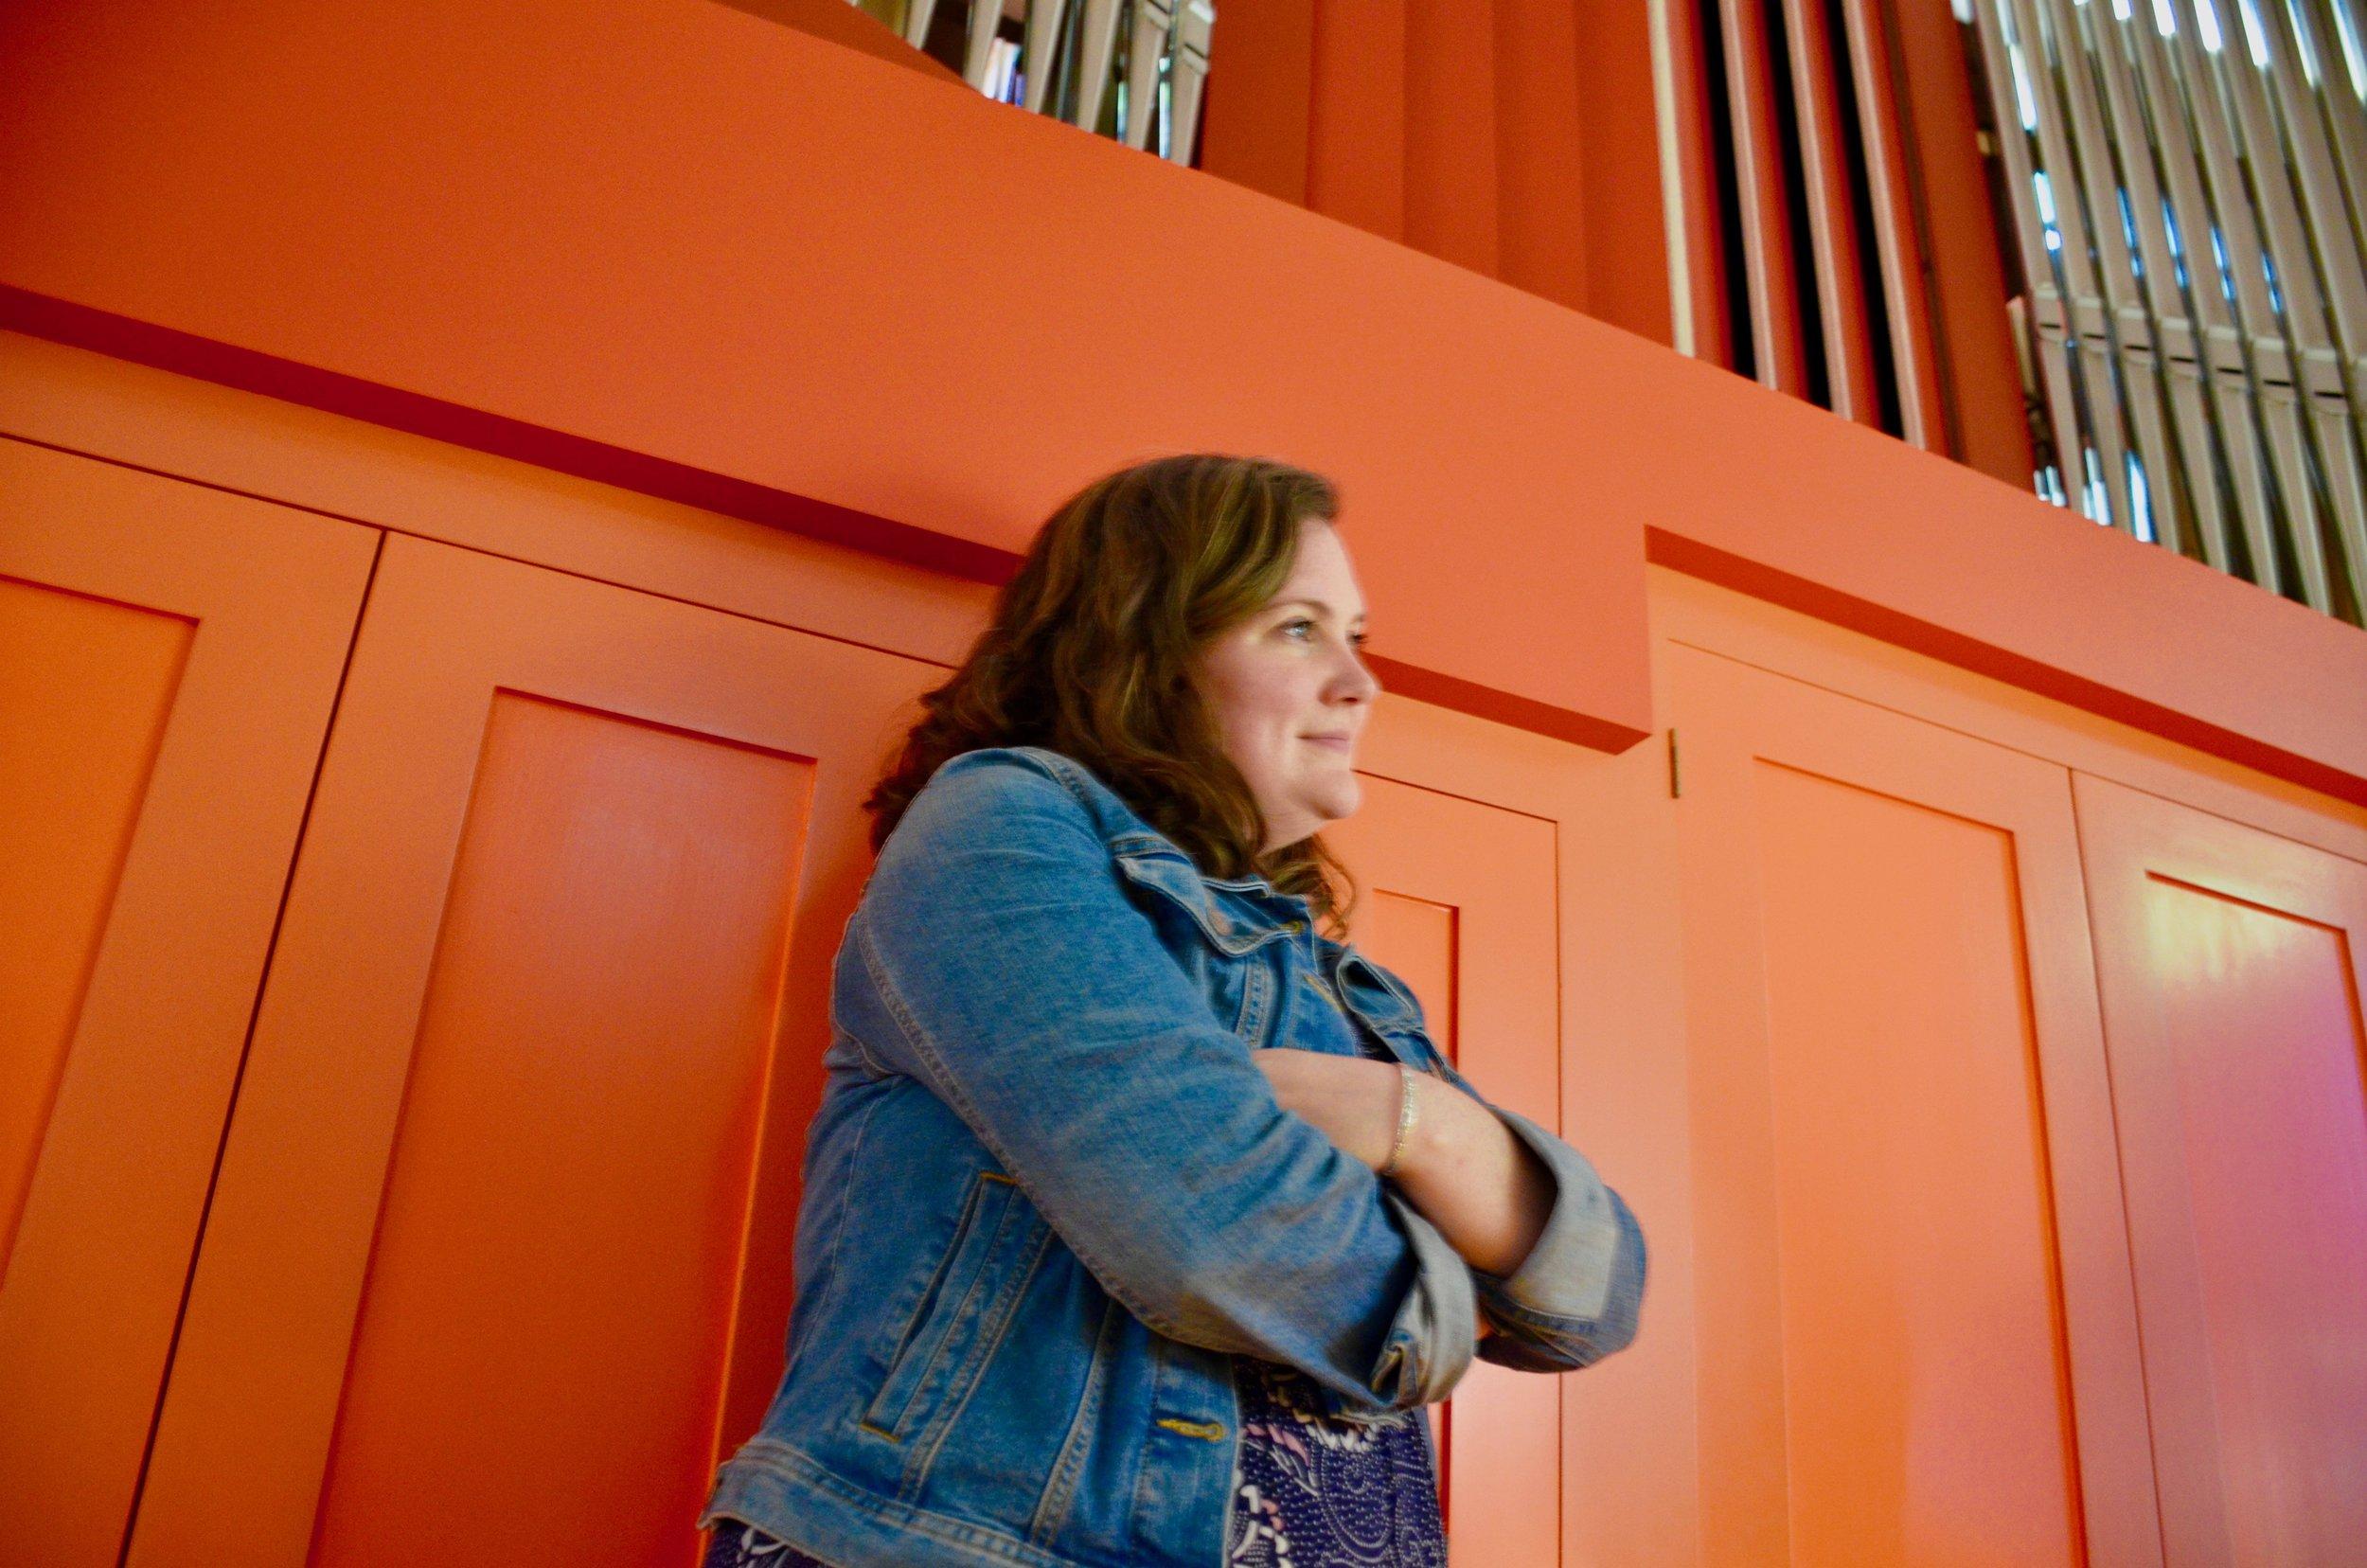 Chelsea Keating observes at Orgelpark, Amsterdam.